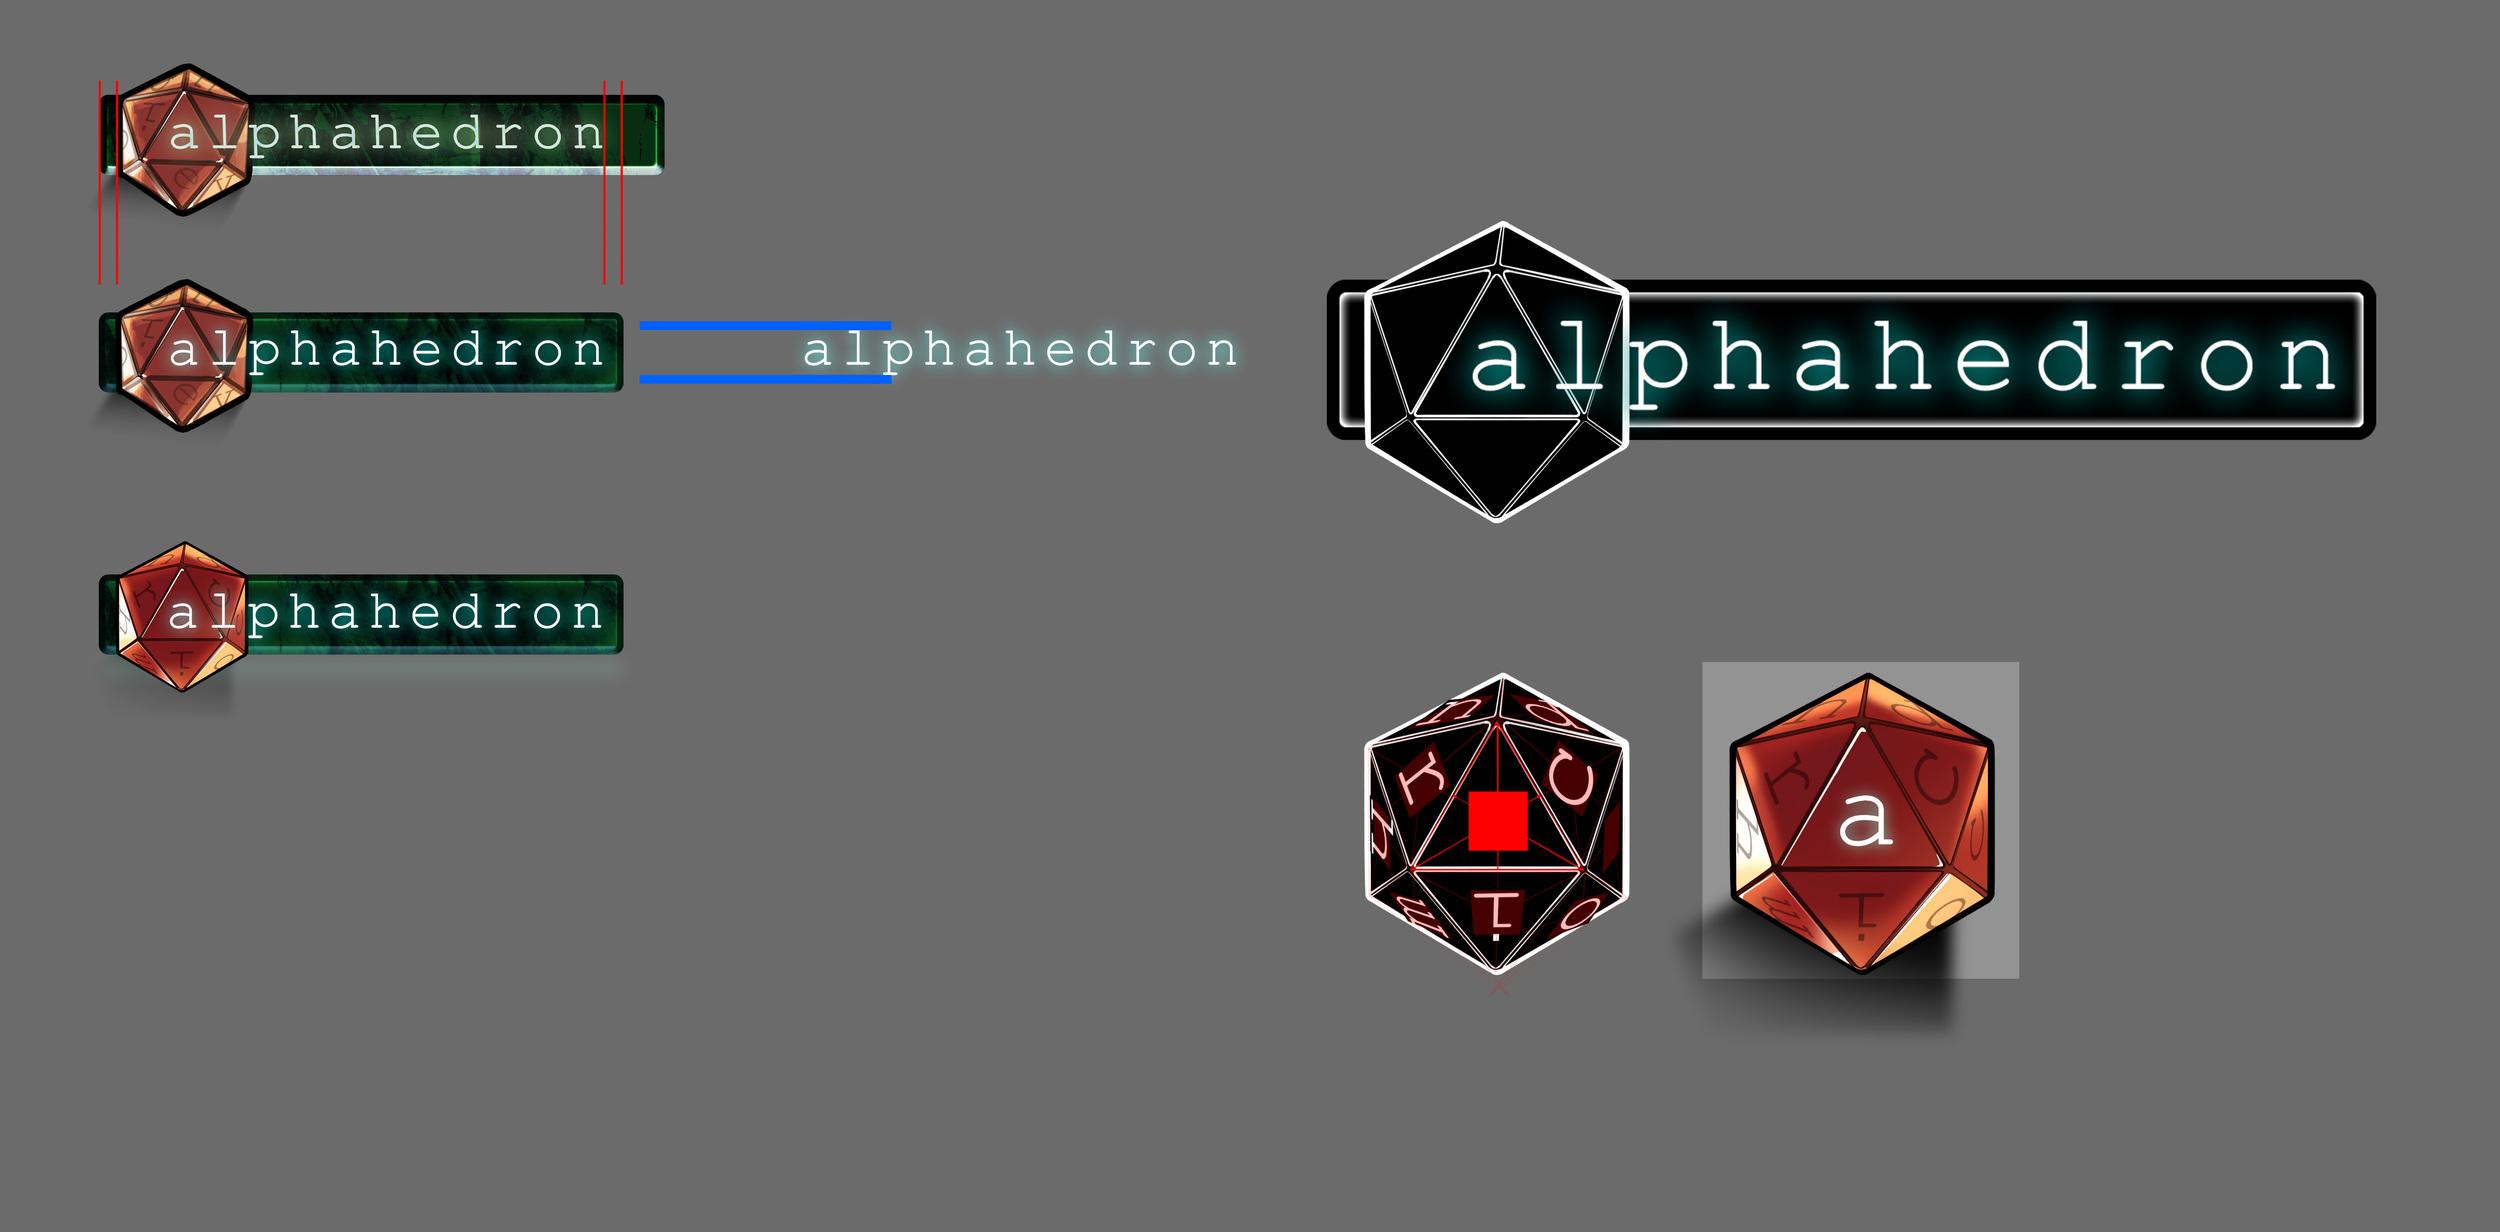 Alphahedron_logo_2.jpg